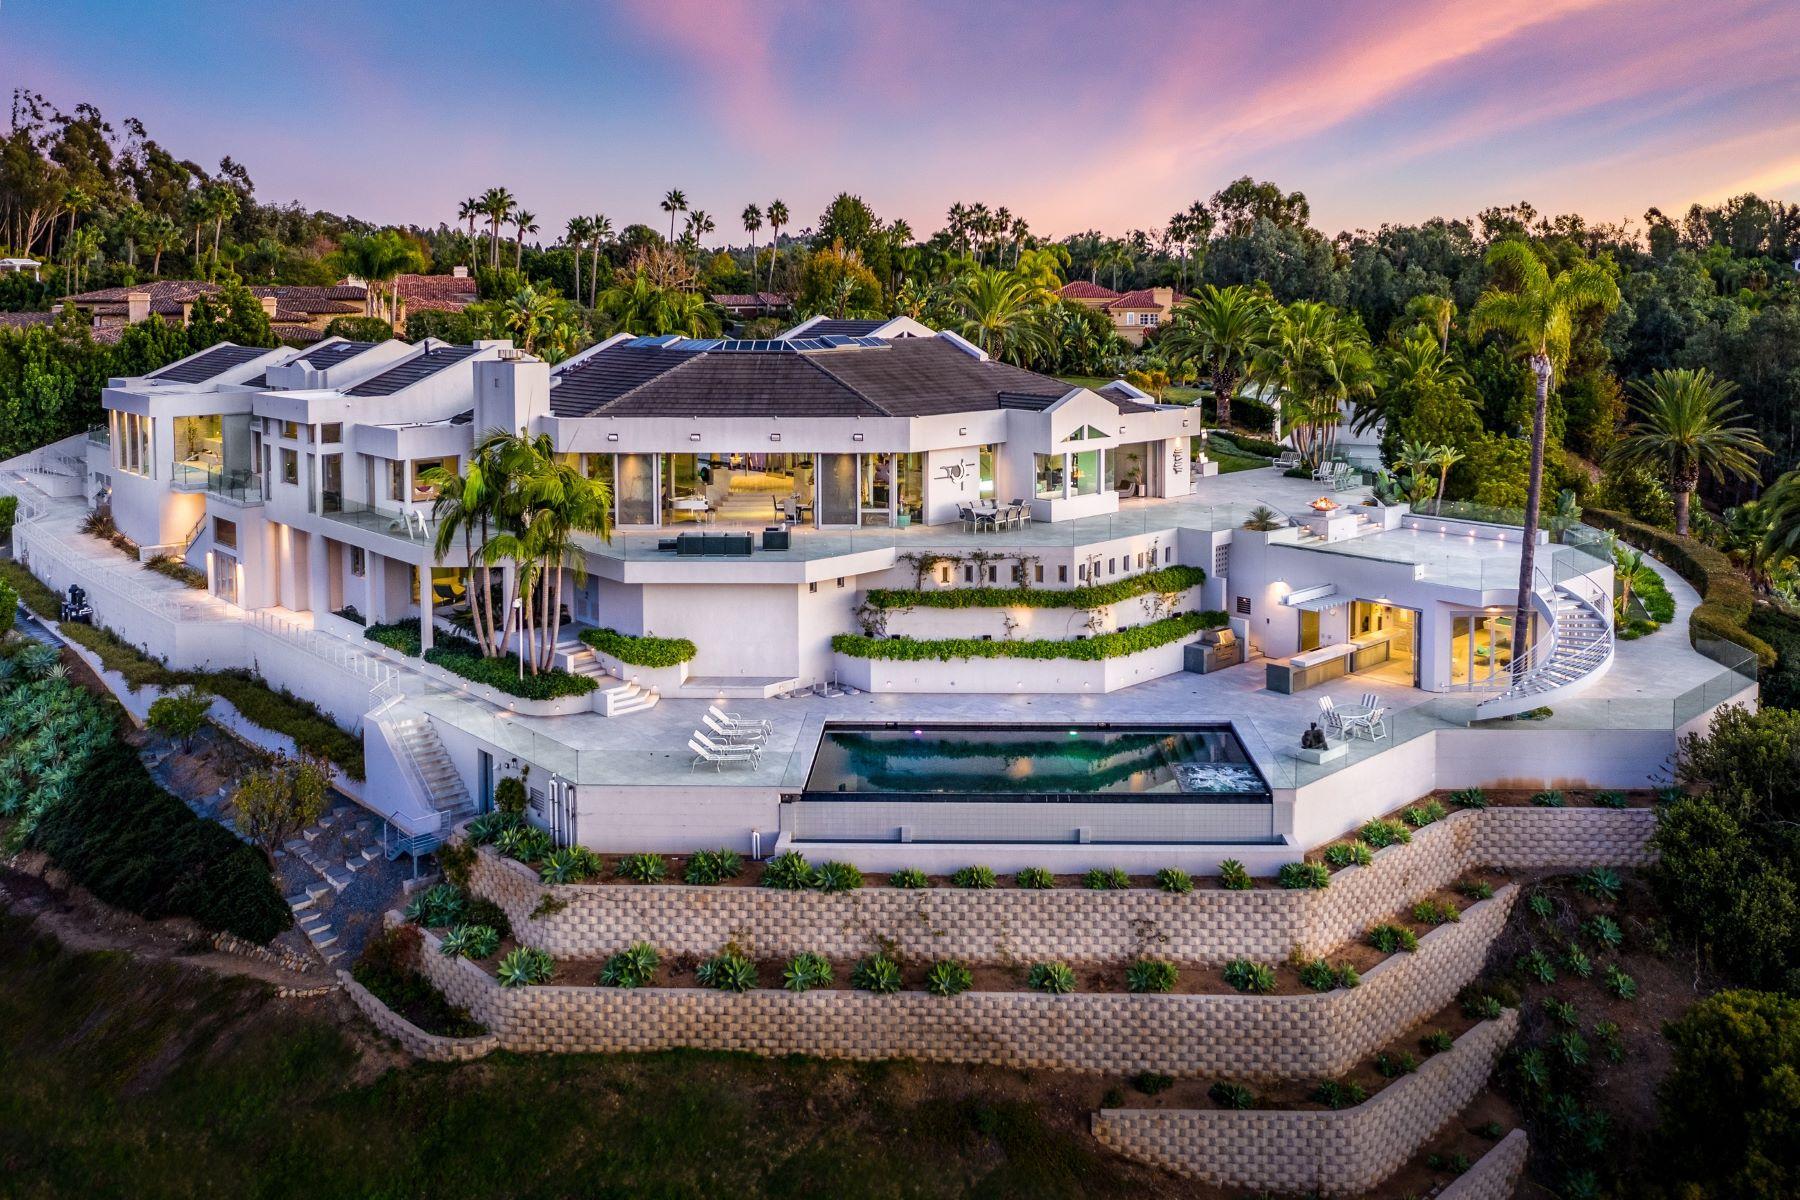 Single Family Homes for Sale at Live Epic 6002 Via Posada Del Norte Rancho Santa Fe, California 92067 United States